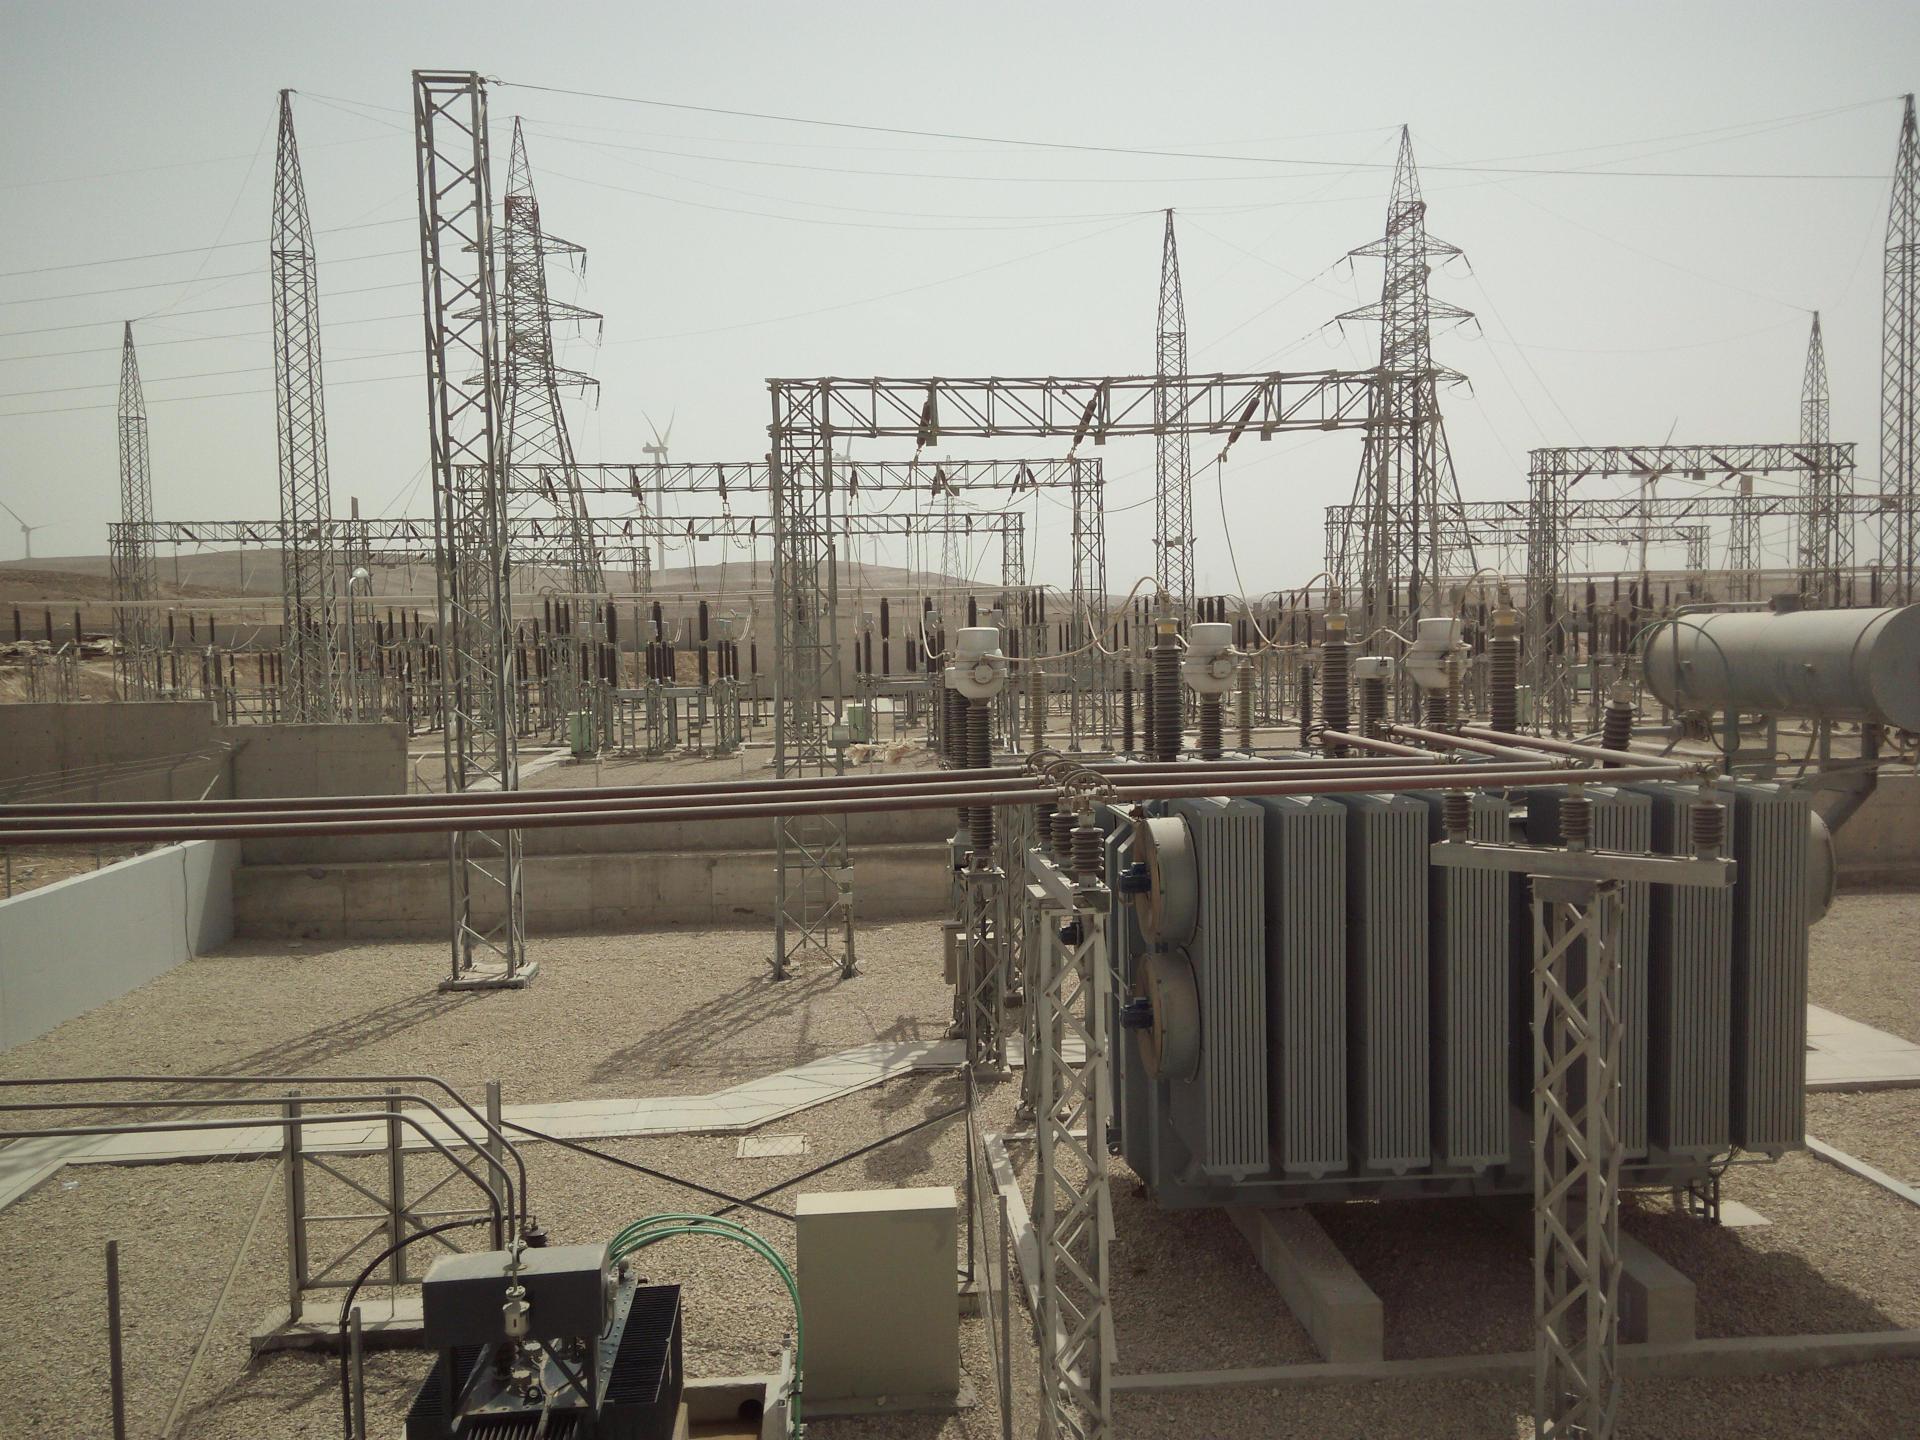 Parque eólico Al Tafila 117 MW